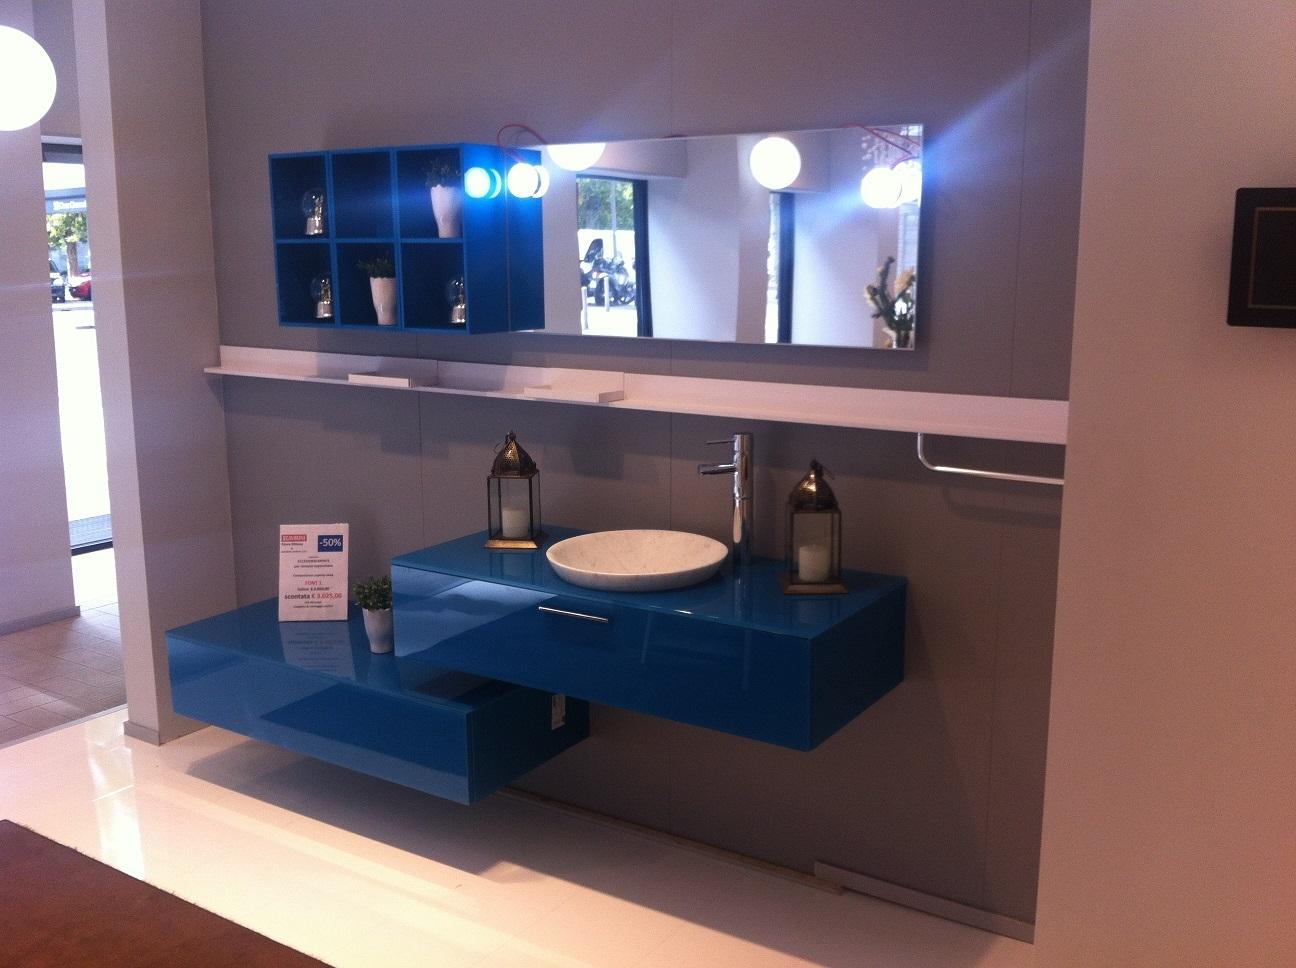 Scavolini offerta outlet bagno mod font arredo bagno a - Outlet piastrelle bagno ...